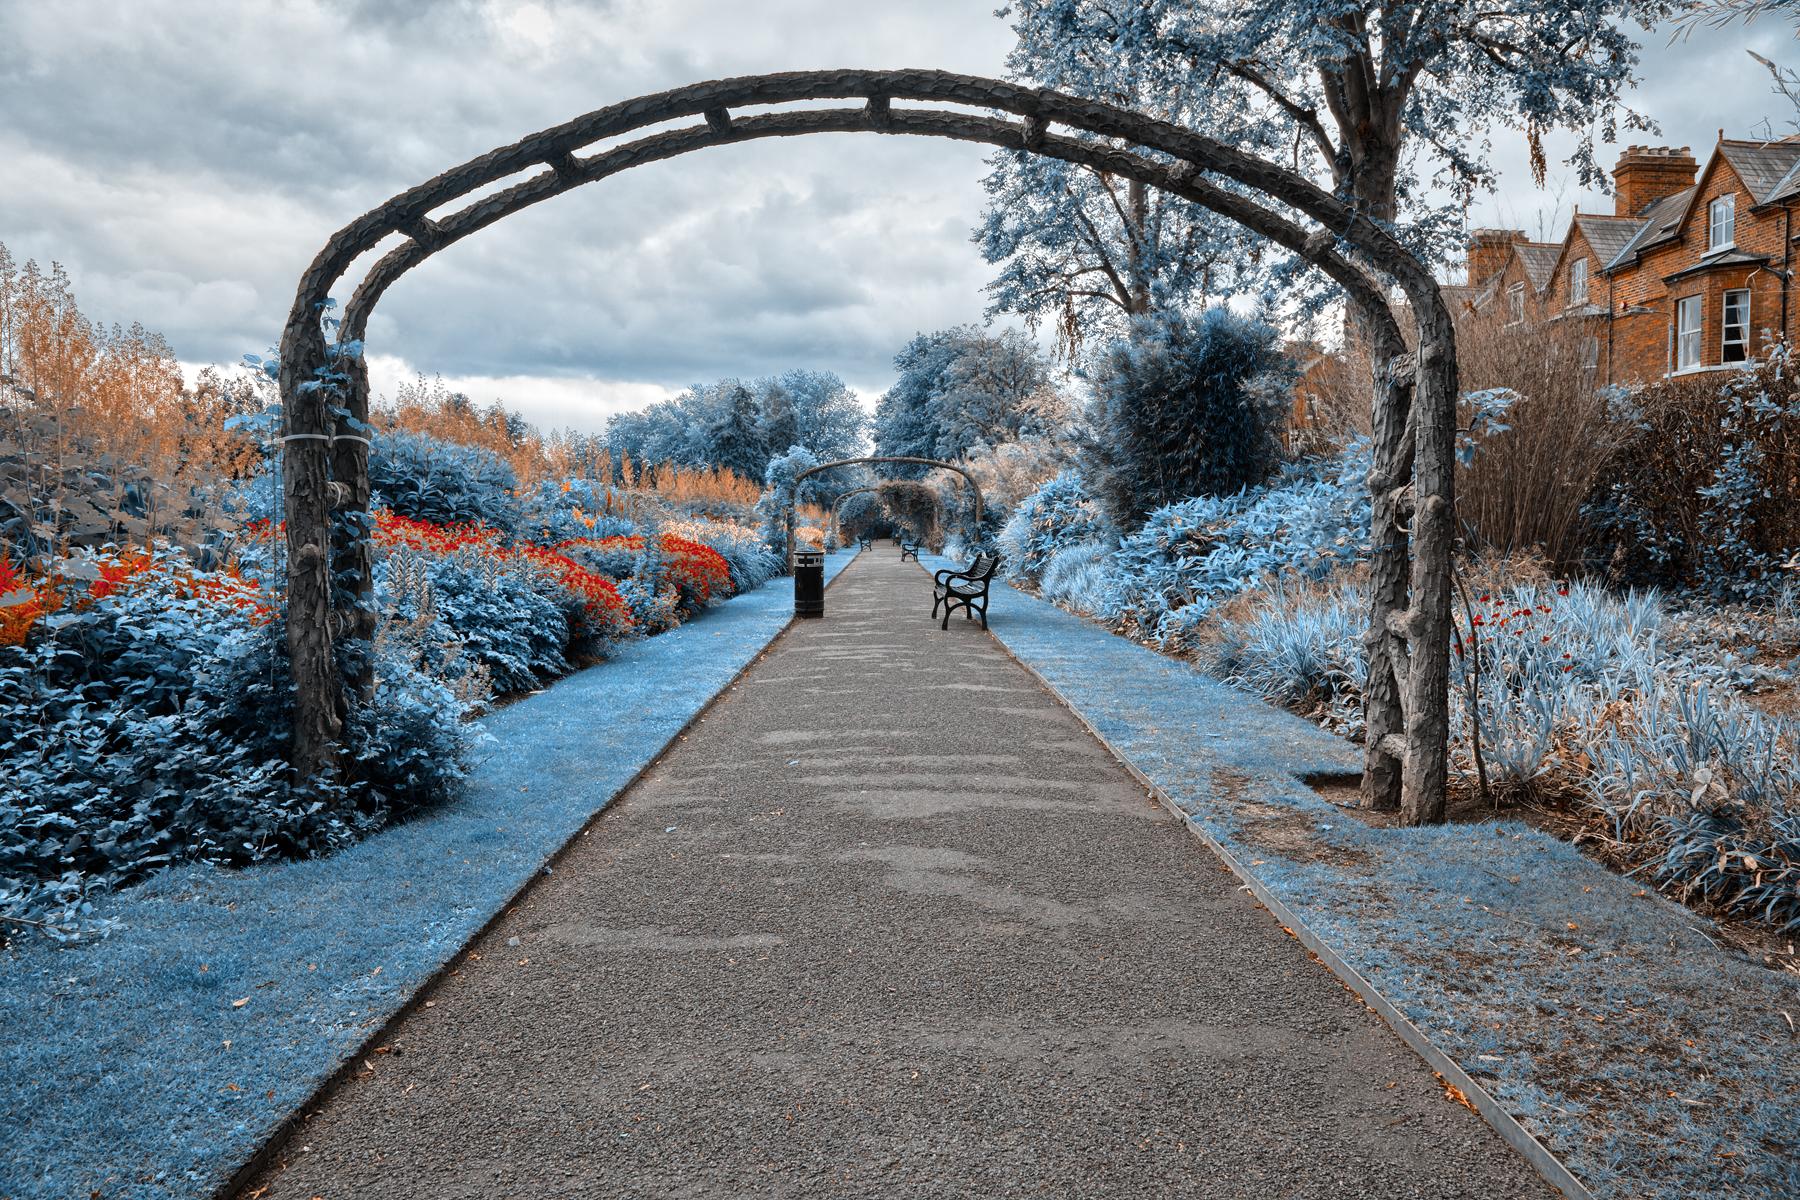 Blue belfast botanic gardens - hdr photo